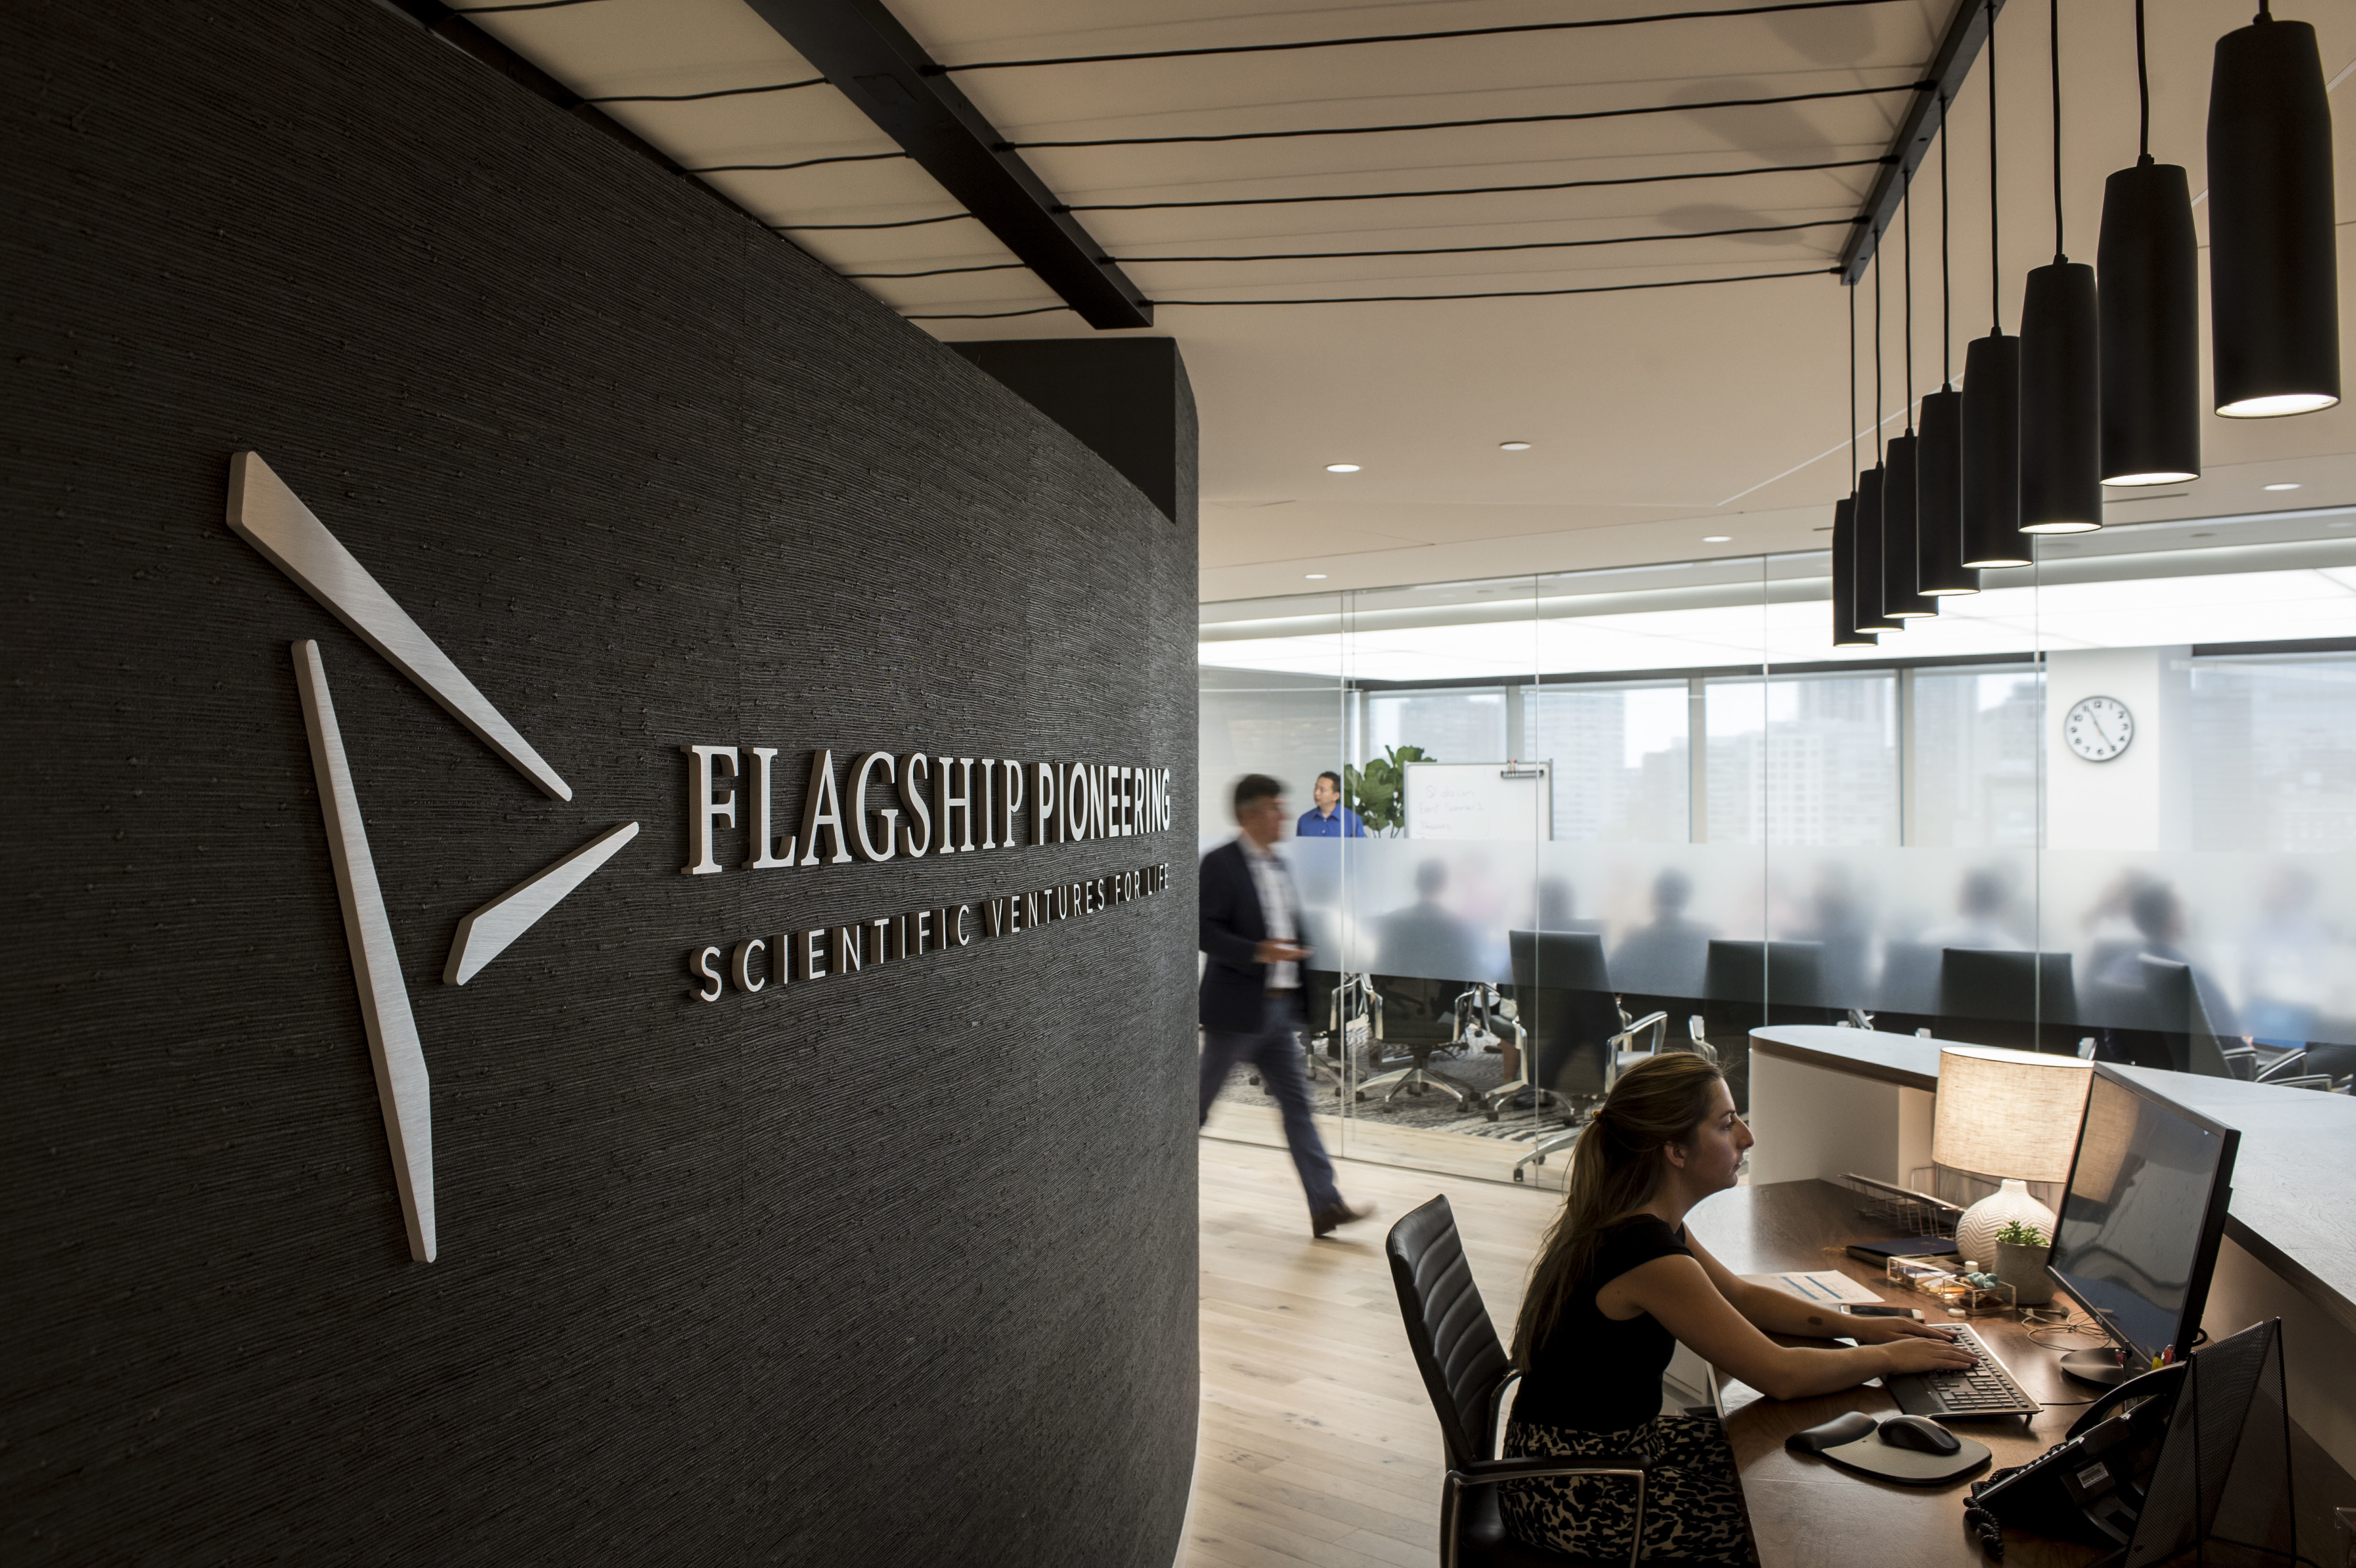 Flagship company Cellarity takes aim at cell behavior